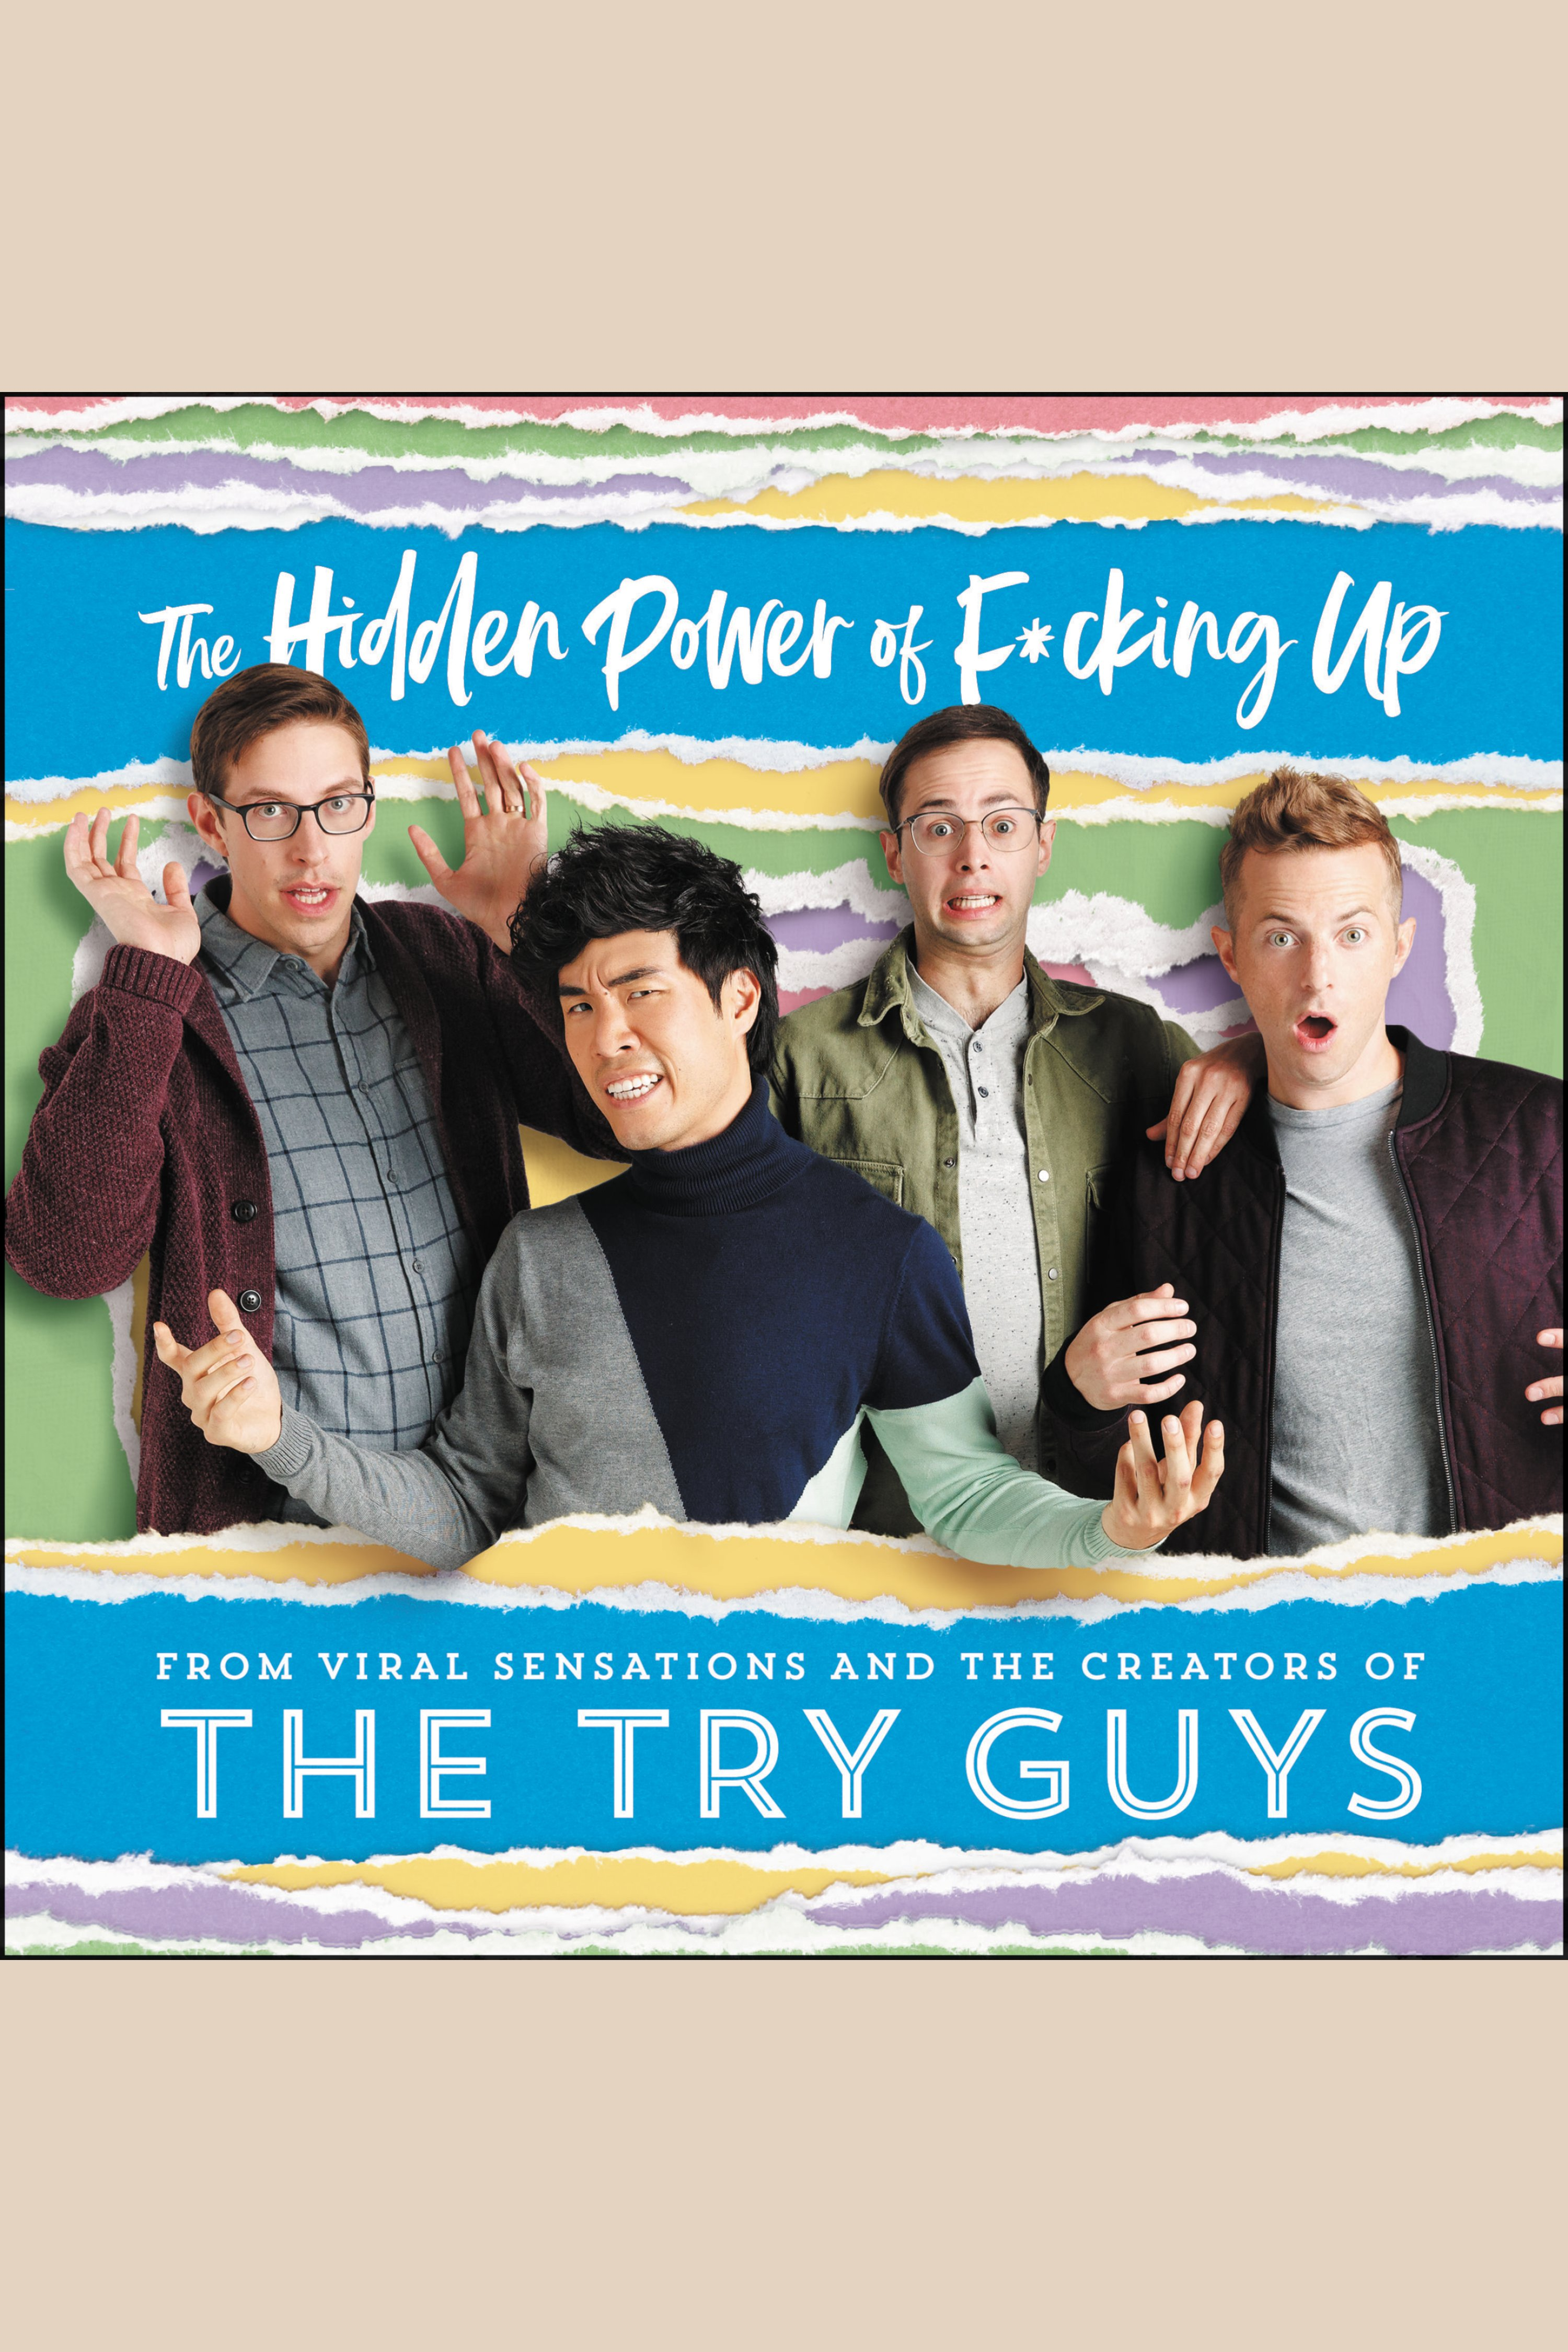 The Hidden Power of F*cking Up